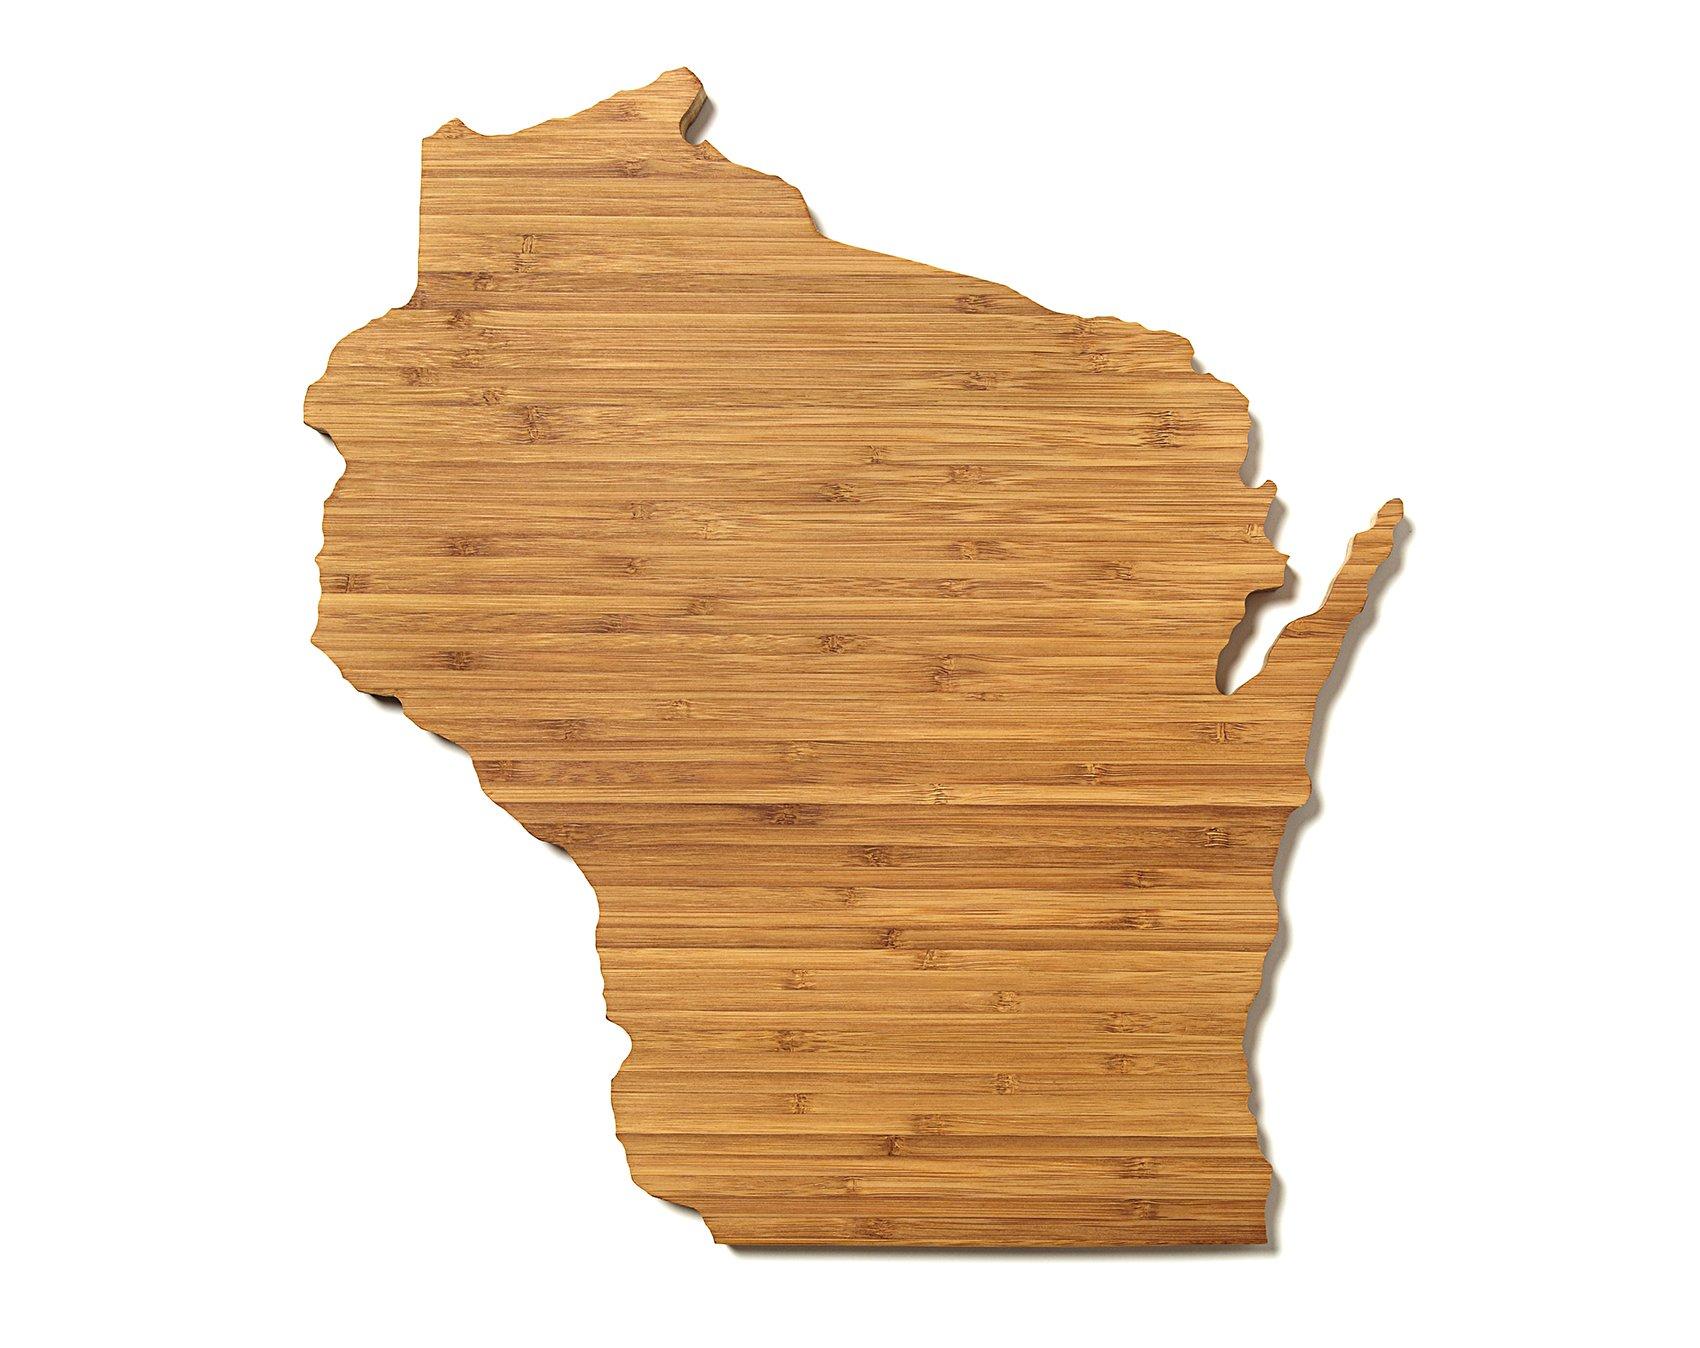 AHeirloom State of Wisconsin Cutting Board